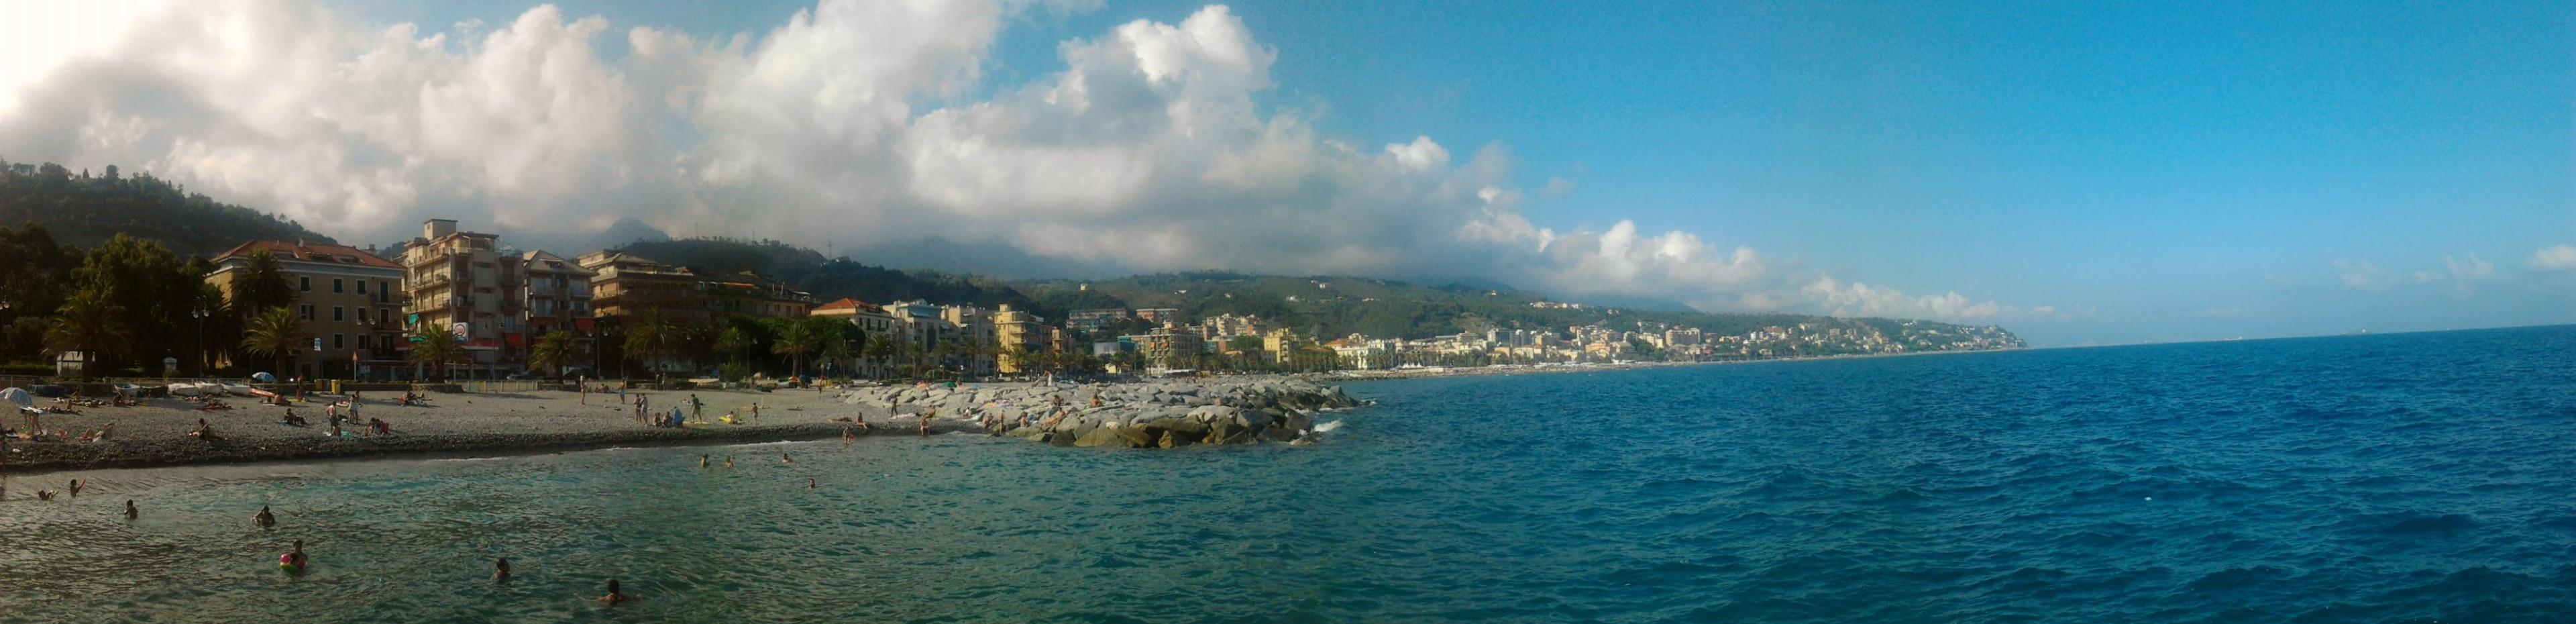 Cogoleto, Liguria, Italy